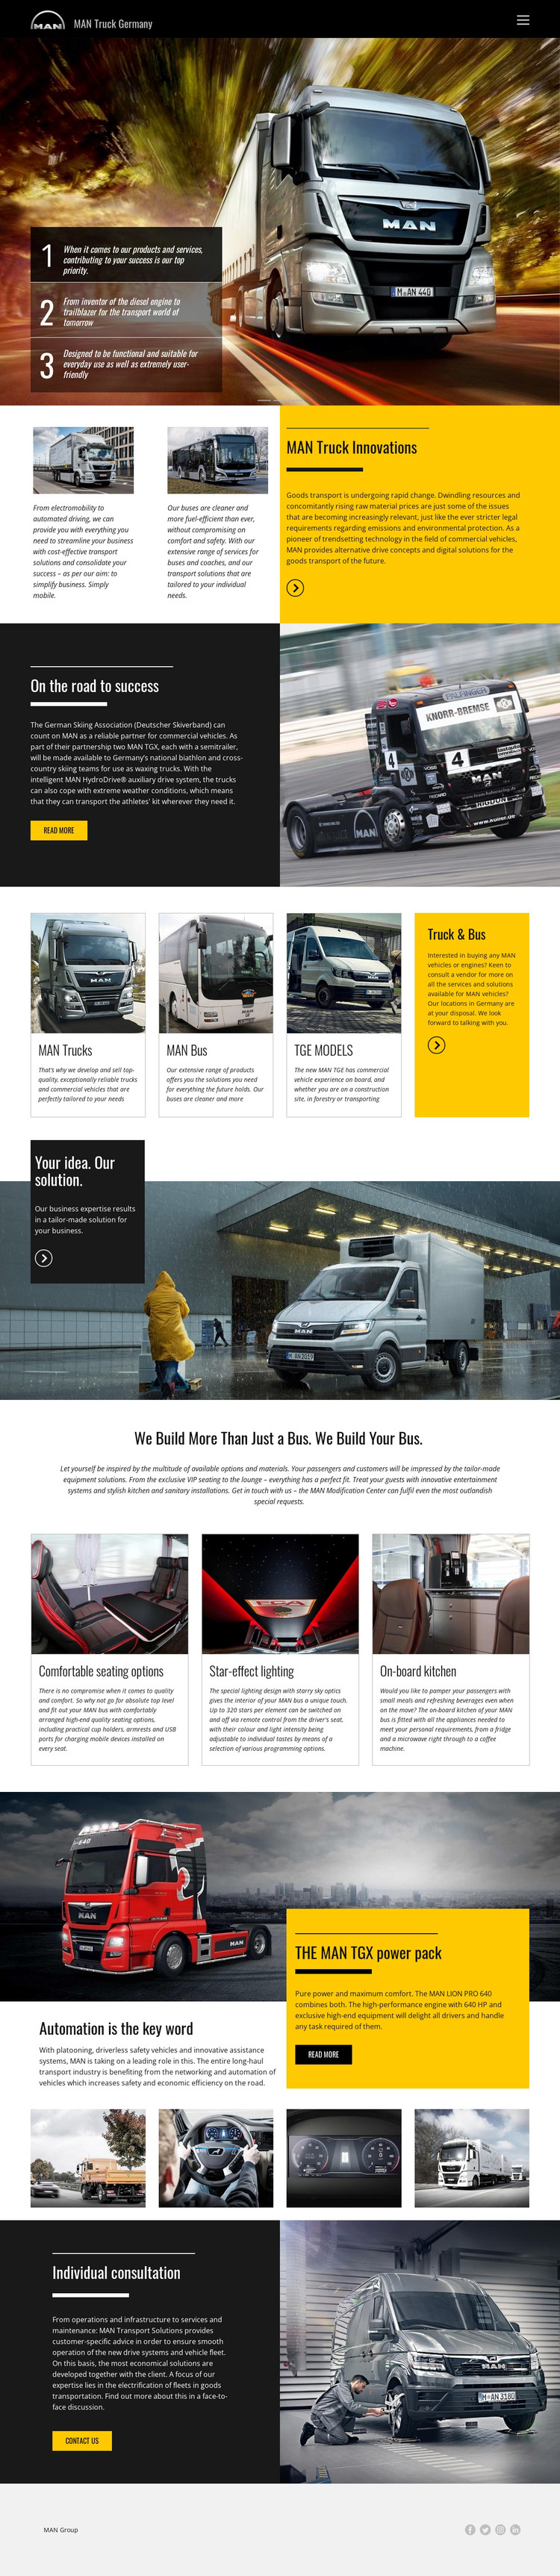 Man trucks for transportation WordPress Theme